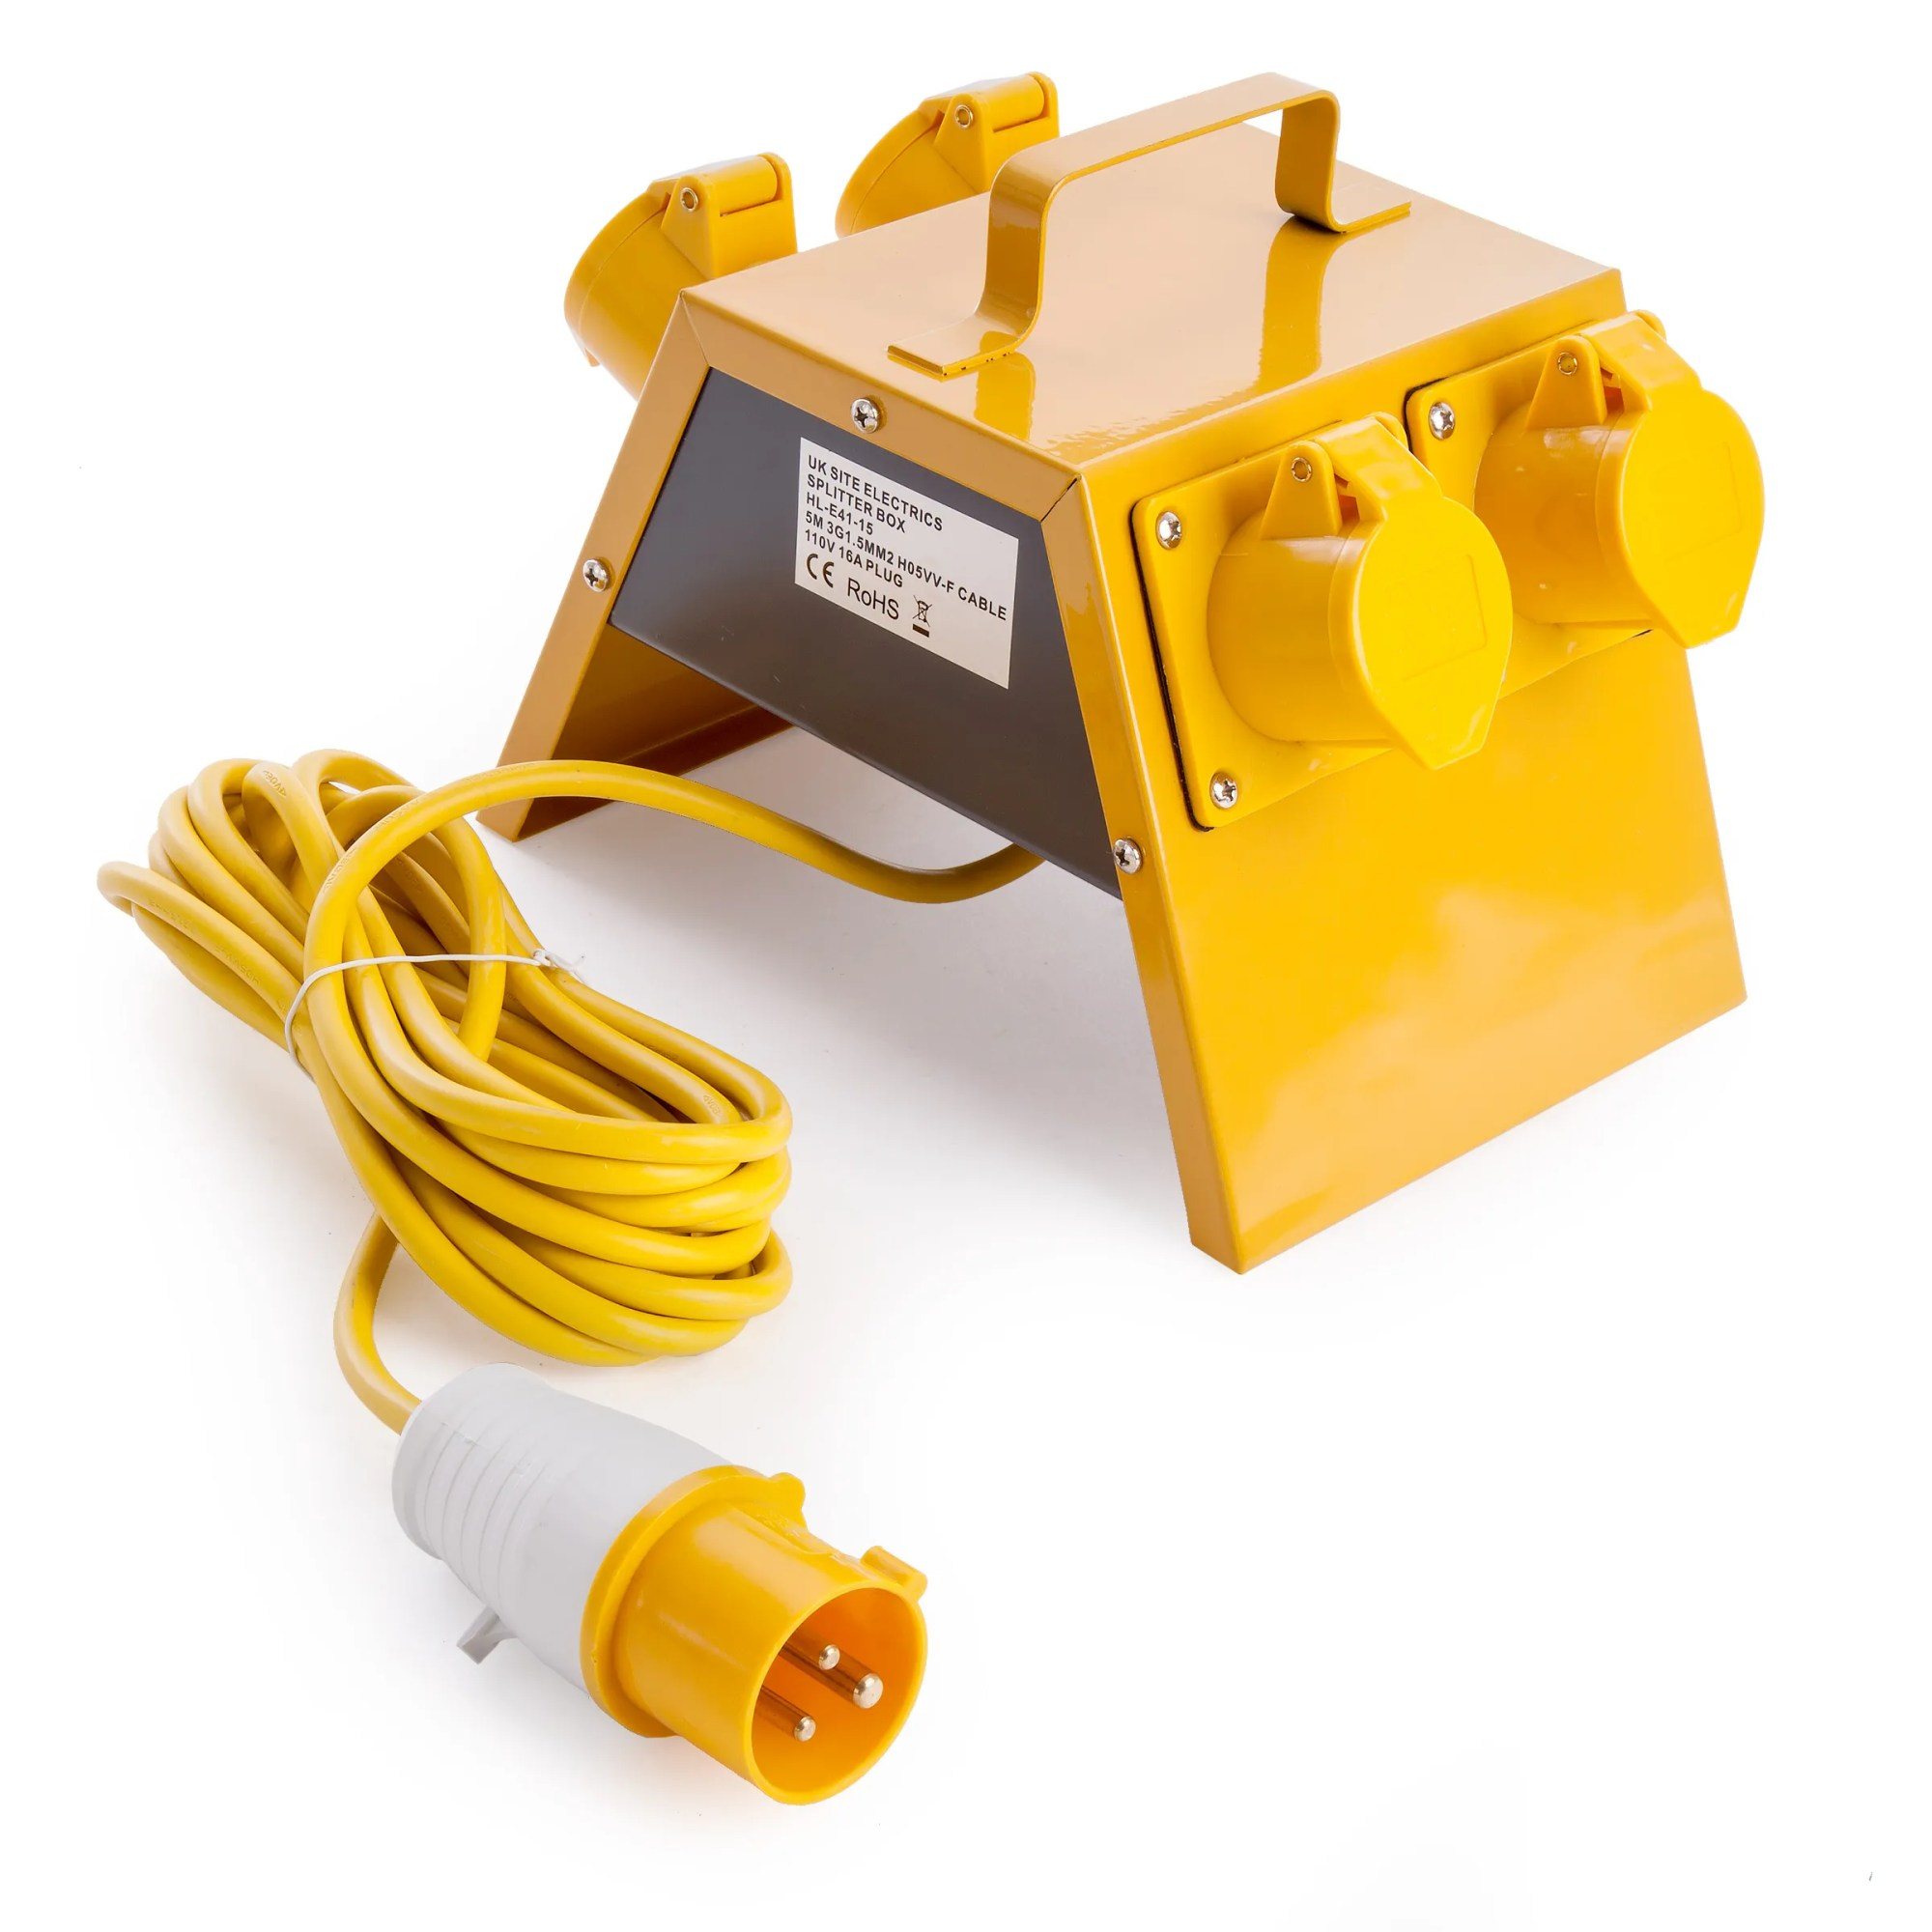 hight resolution of toolstop toolstop 4 way splitter box 110v 21955